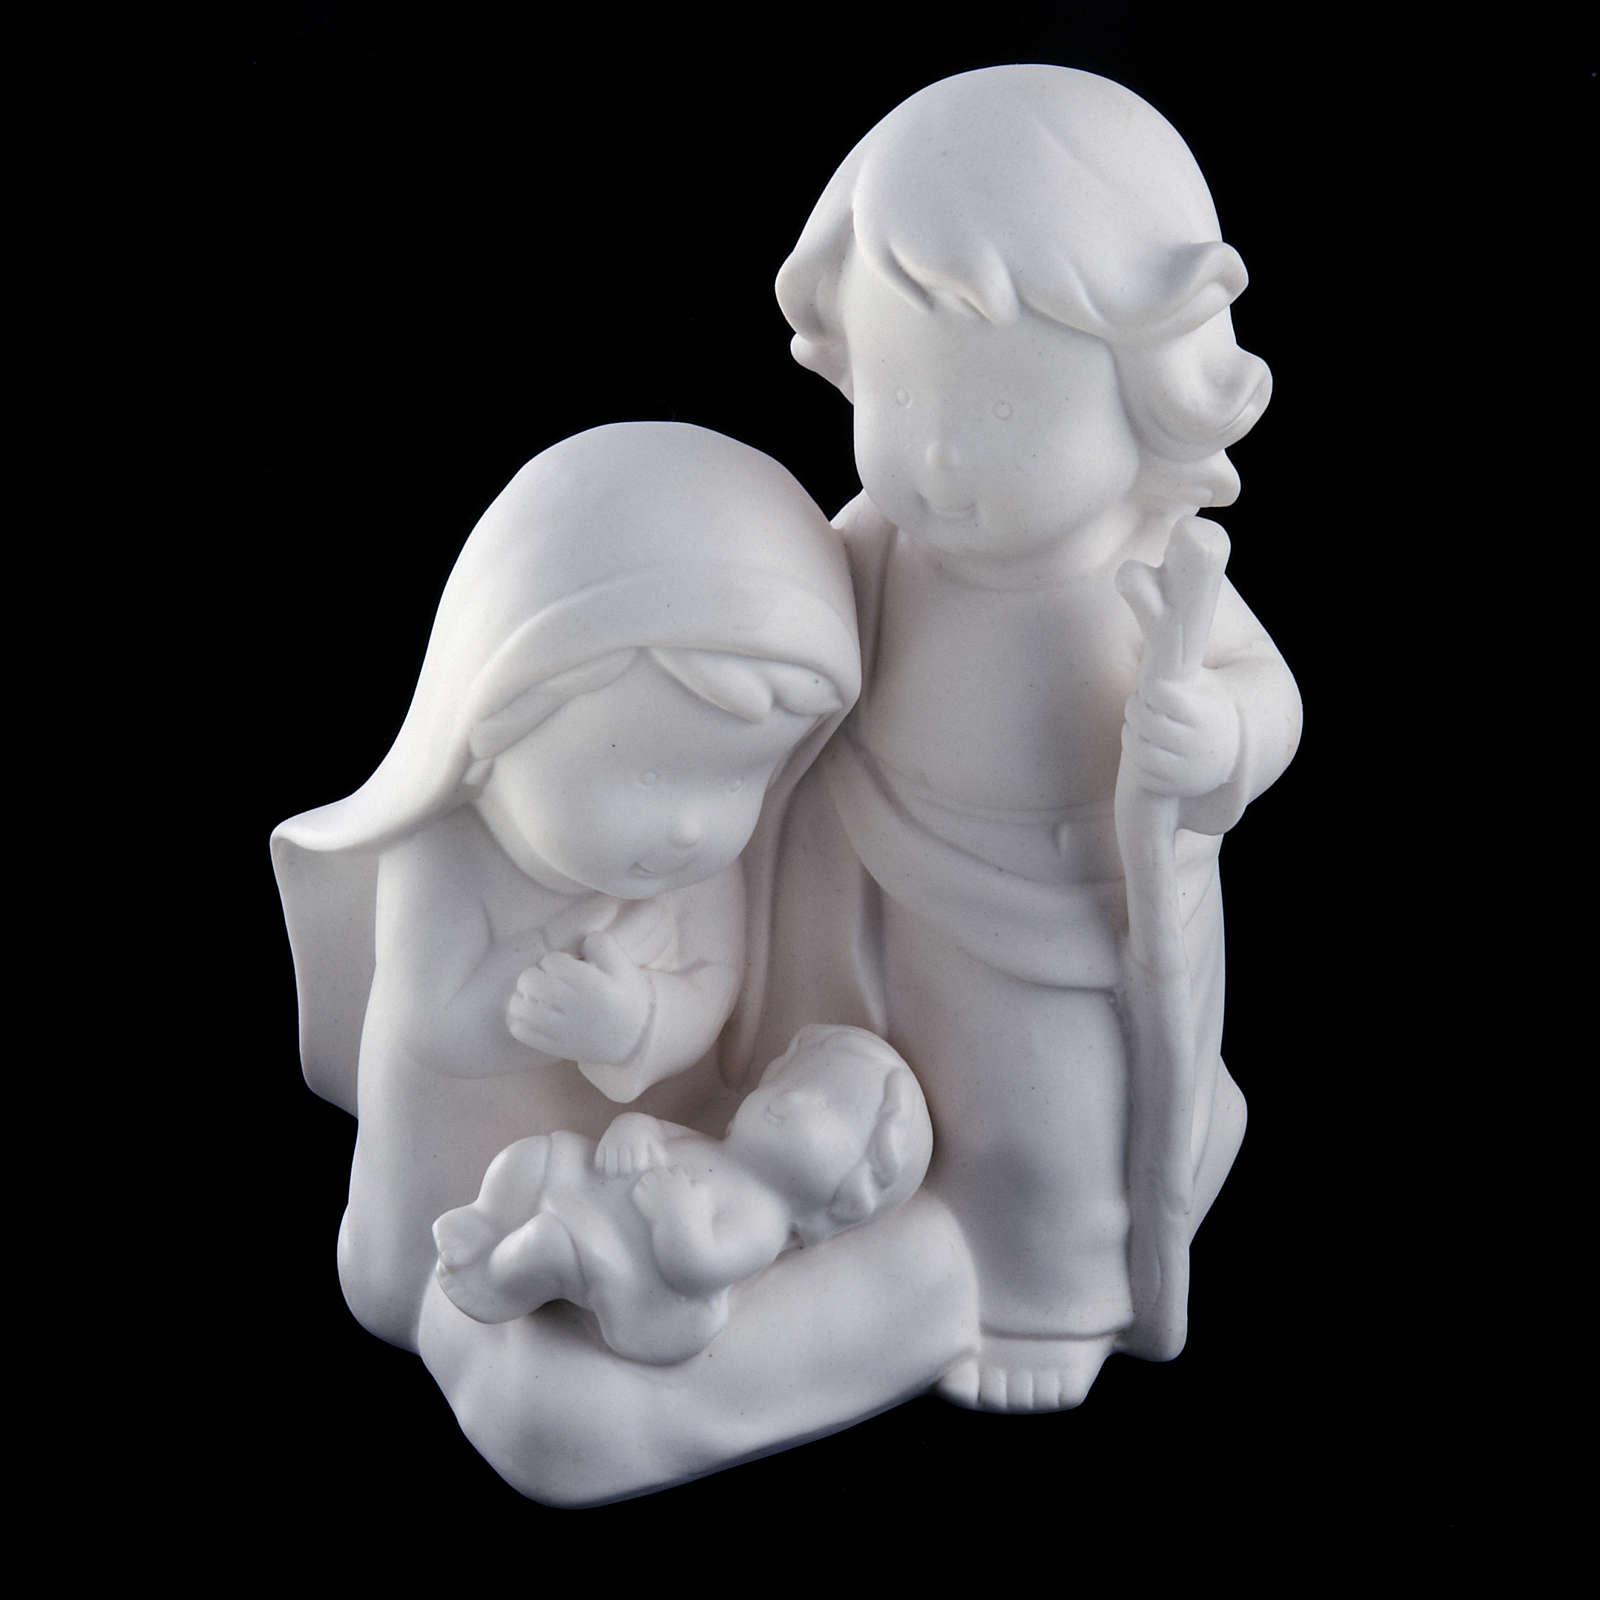 Stylized Nativity, white ceramic 3